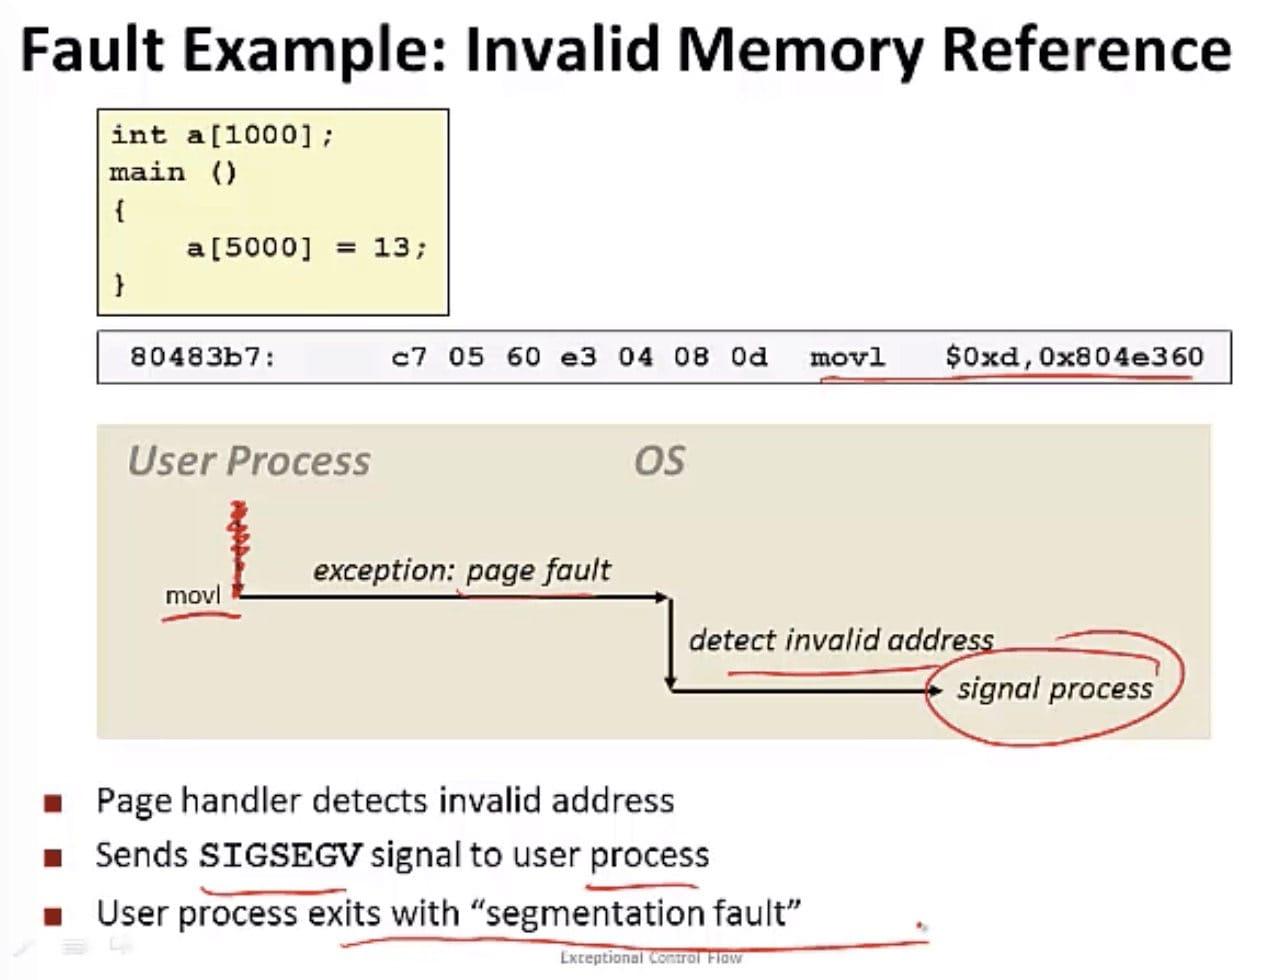 故障例子 - 无效地址(CSE 351 - Processes, Video 1: Exceptional control flow)